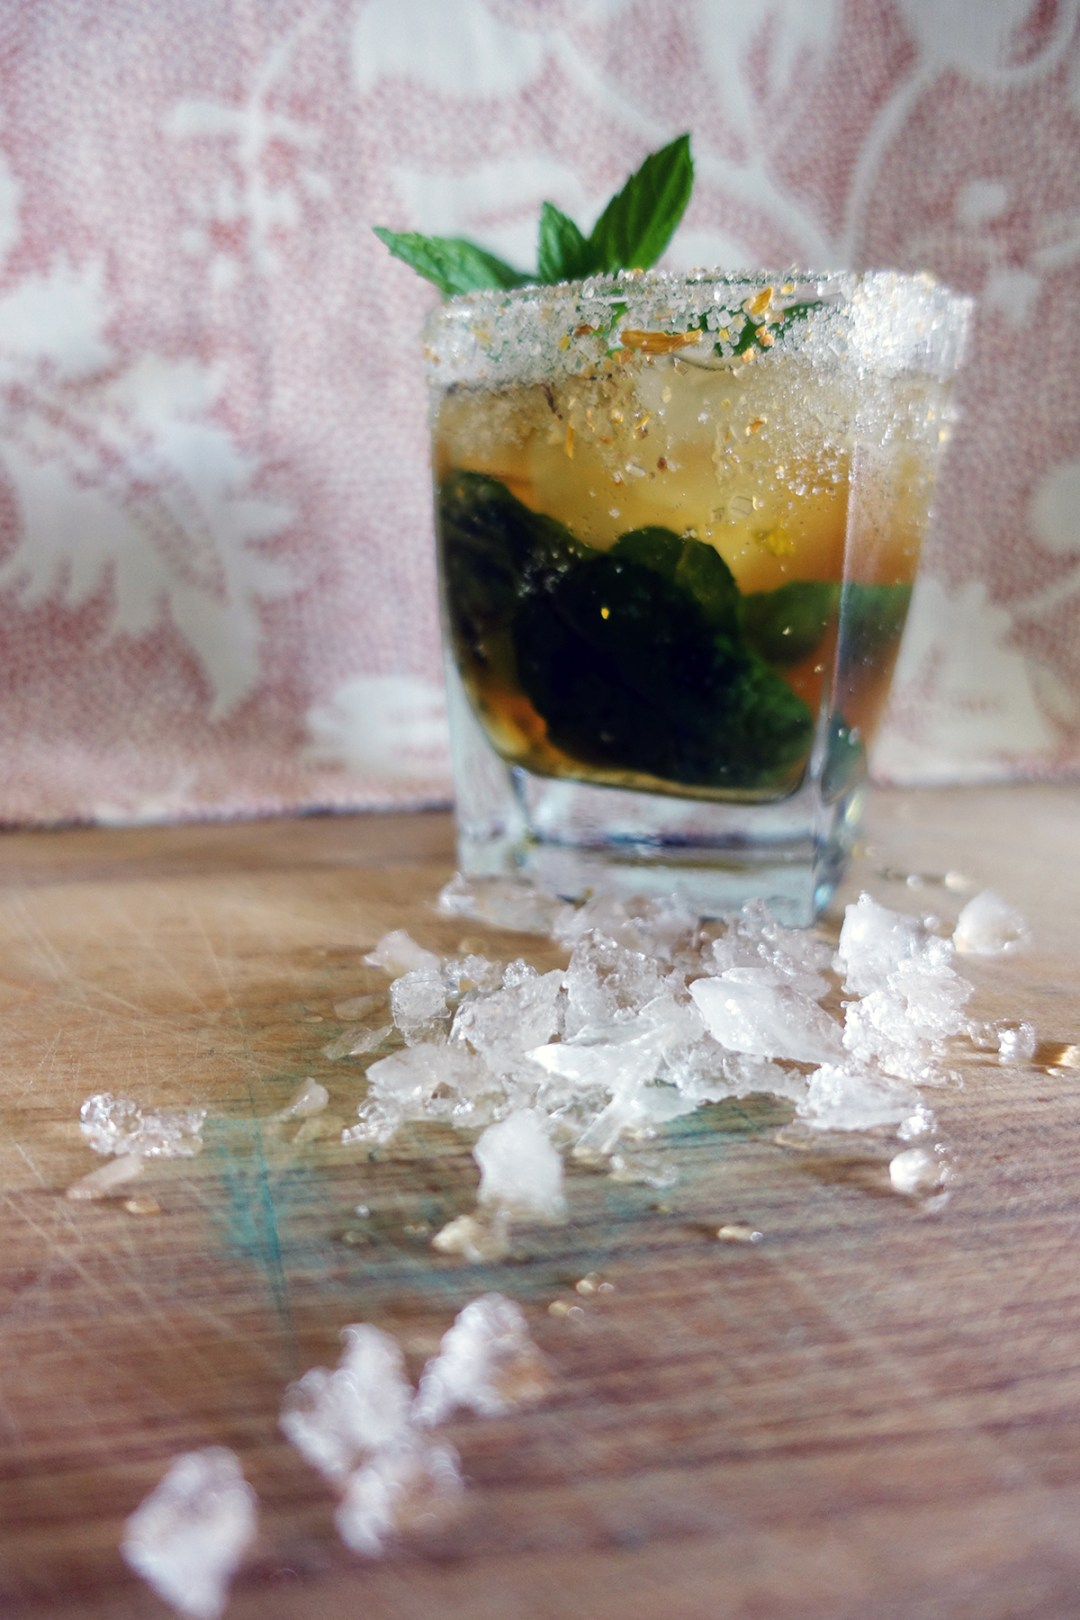 Hopped up Julep, cocktail recipe by rokz